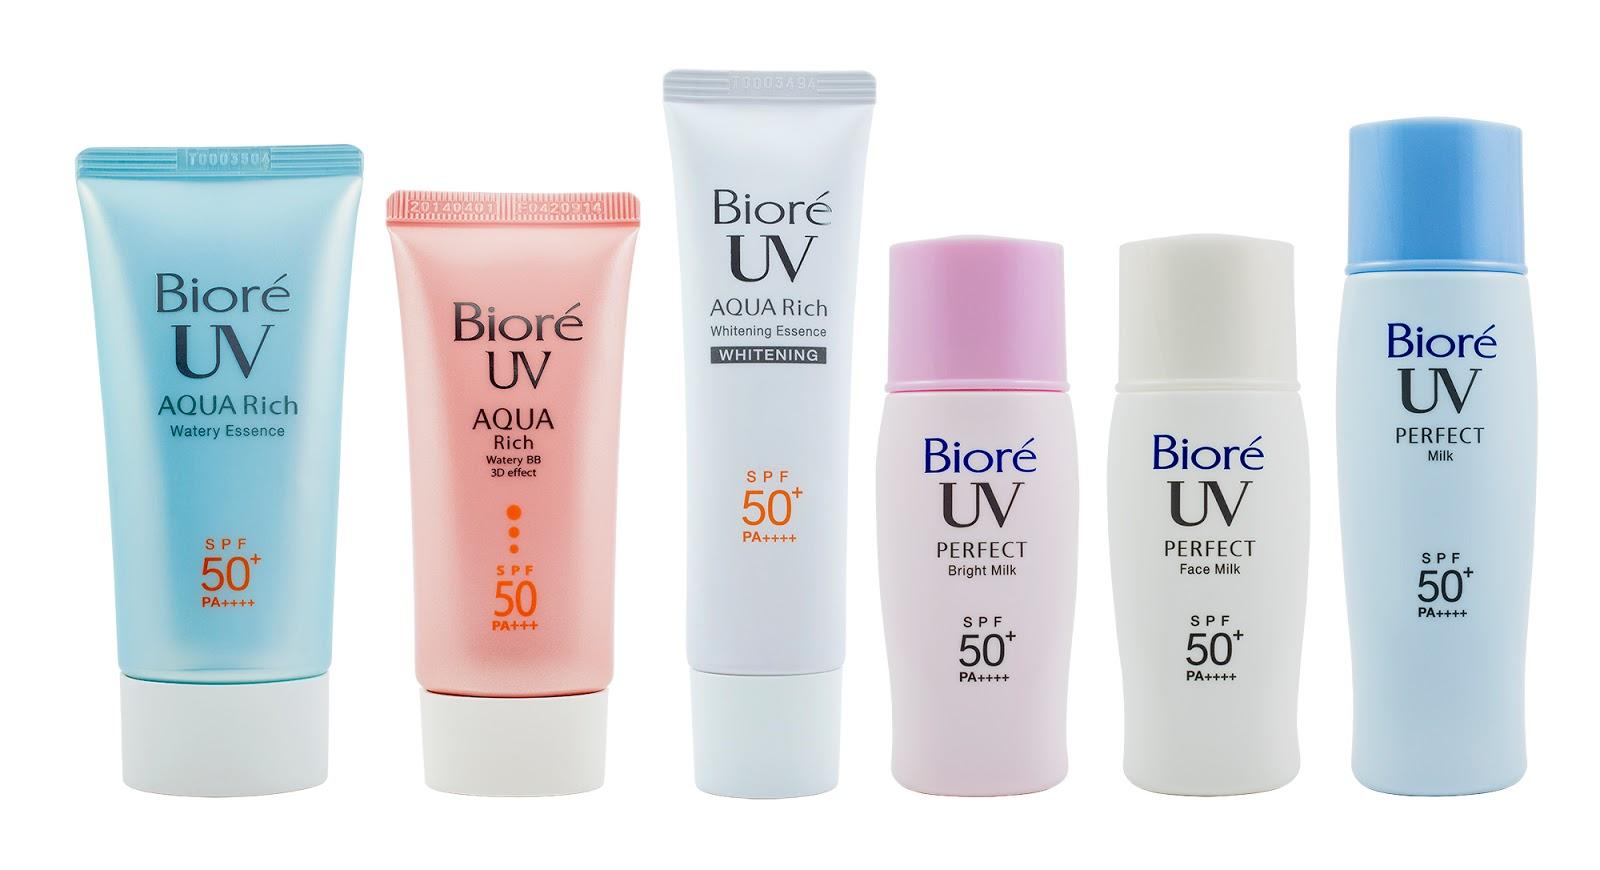 Lucky Citrine: Biore UV Aqua Rich Whitening Essence